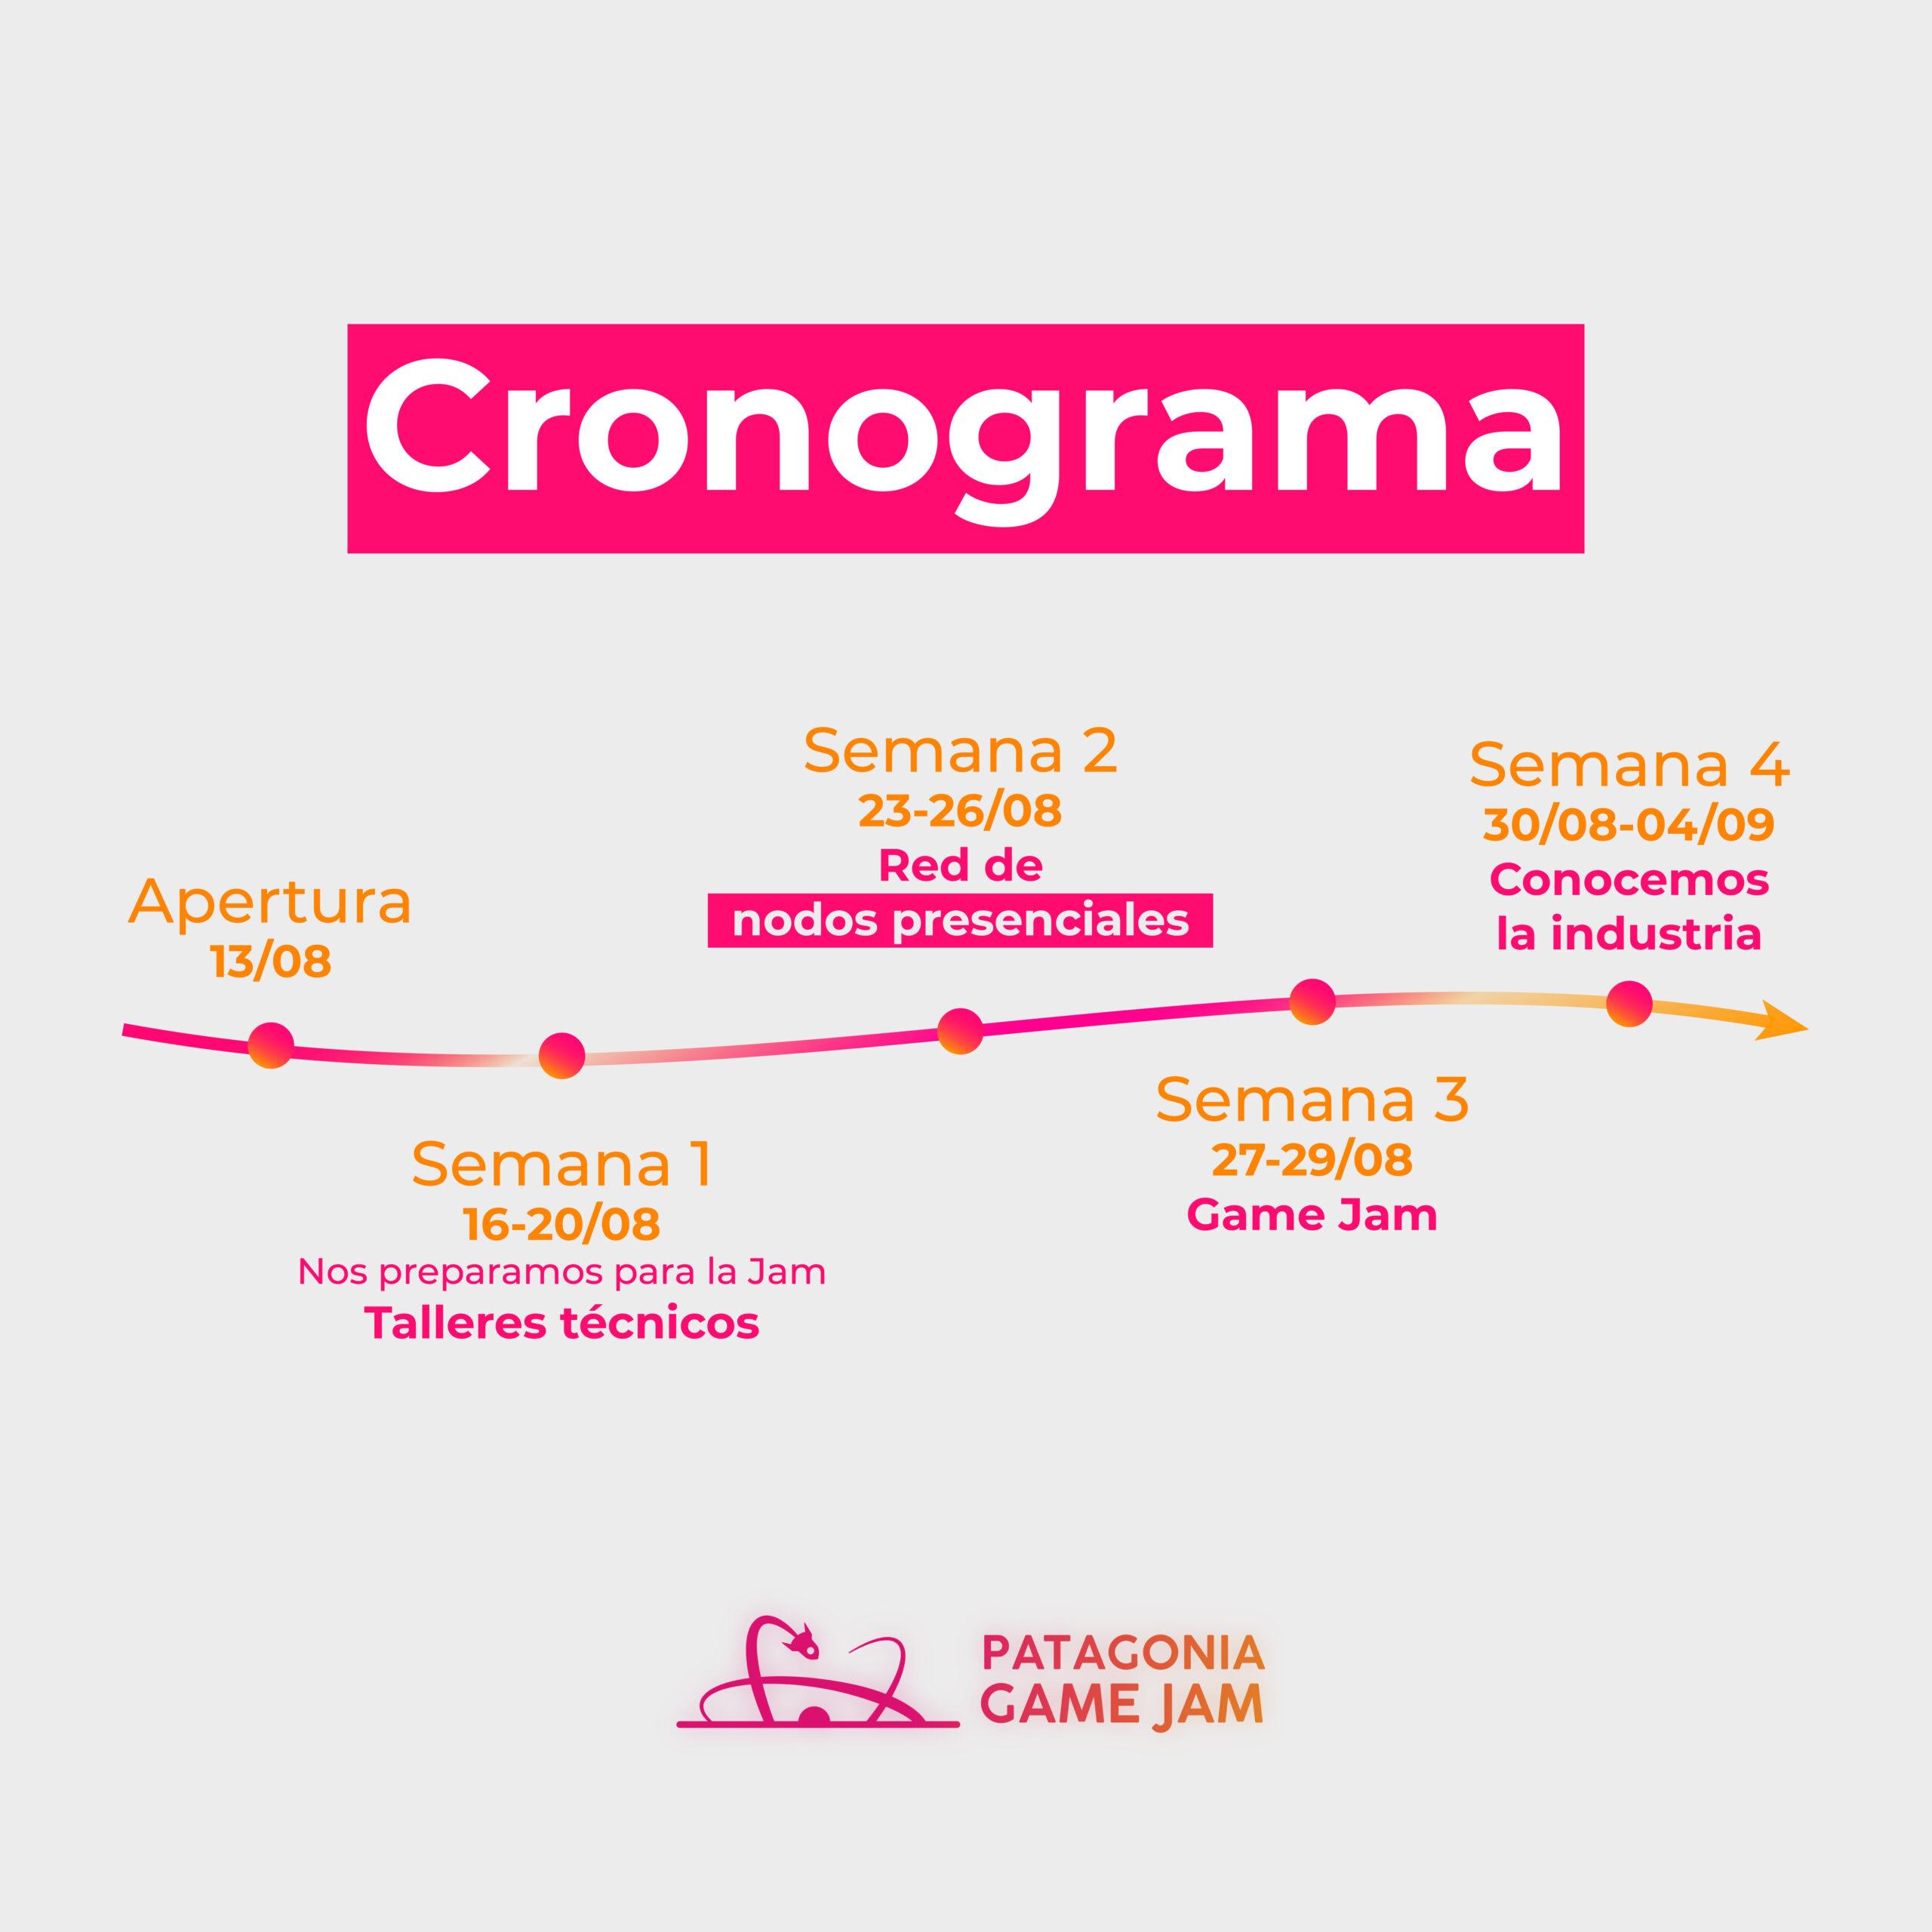 Patagonia Game Jam